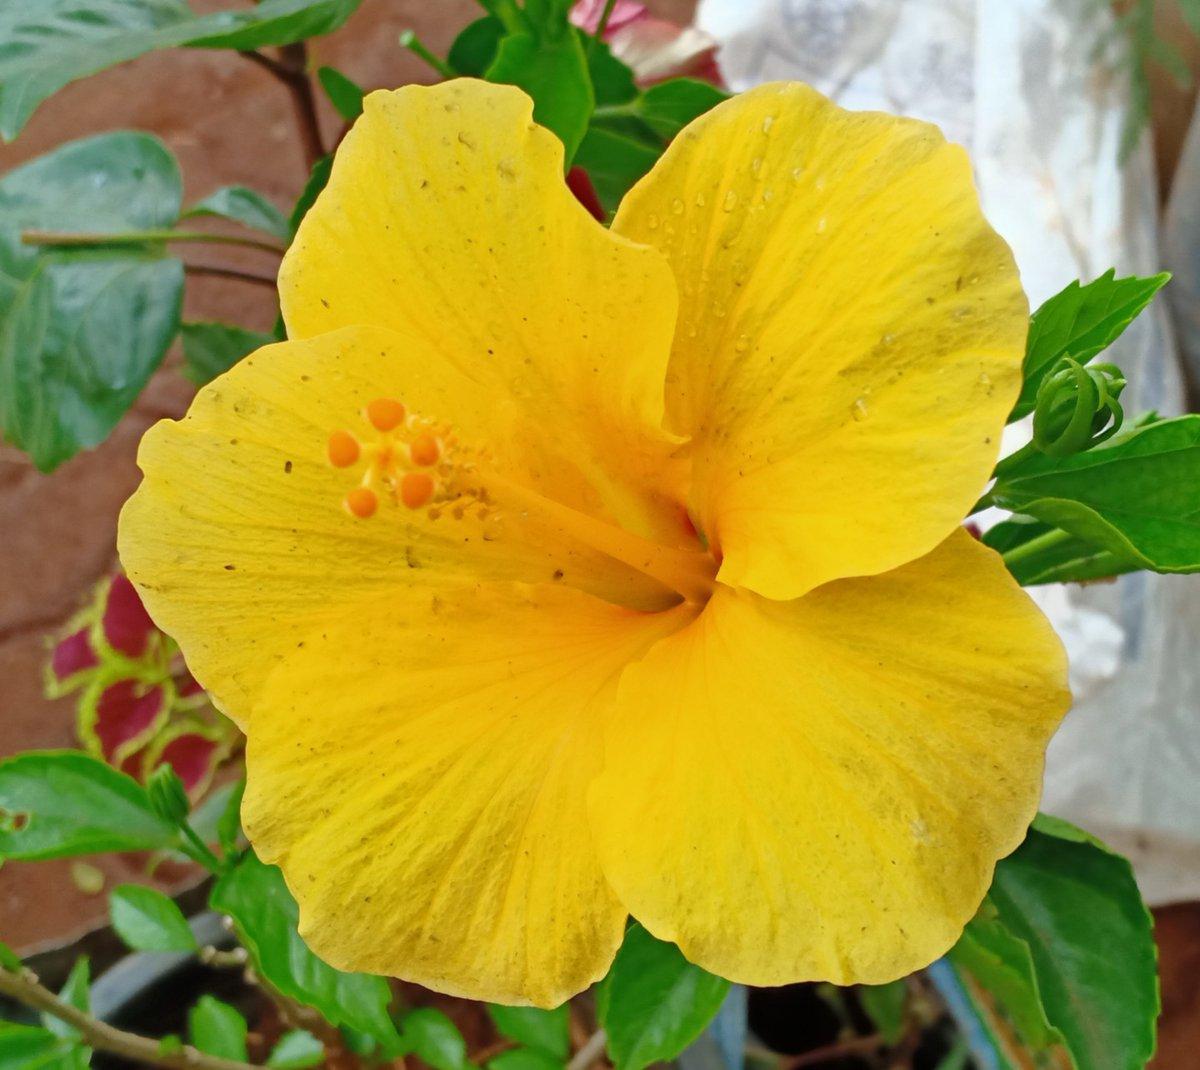 Nature #nature #NaturePhotography #Flowers